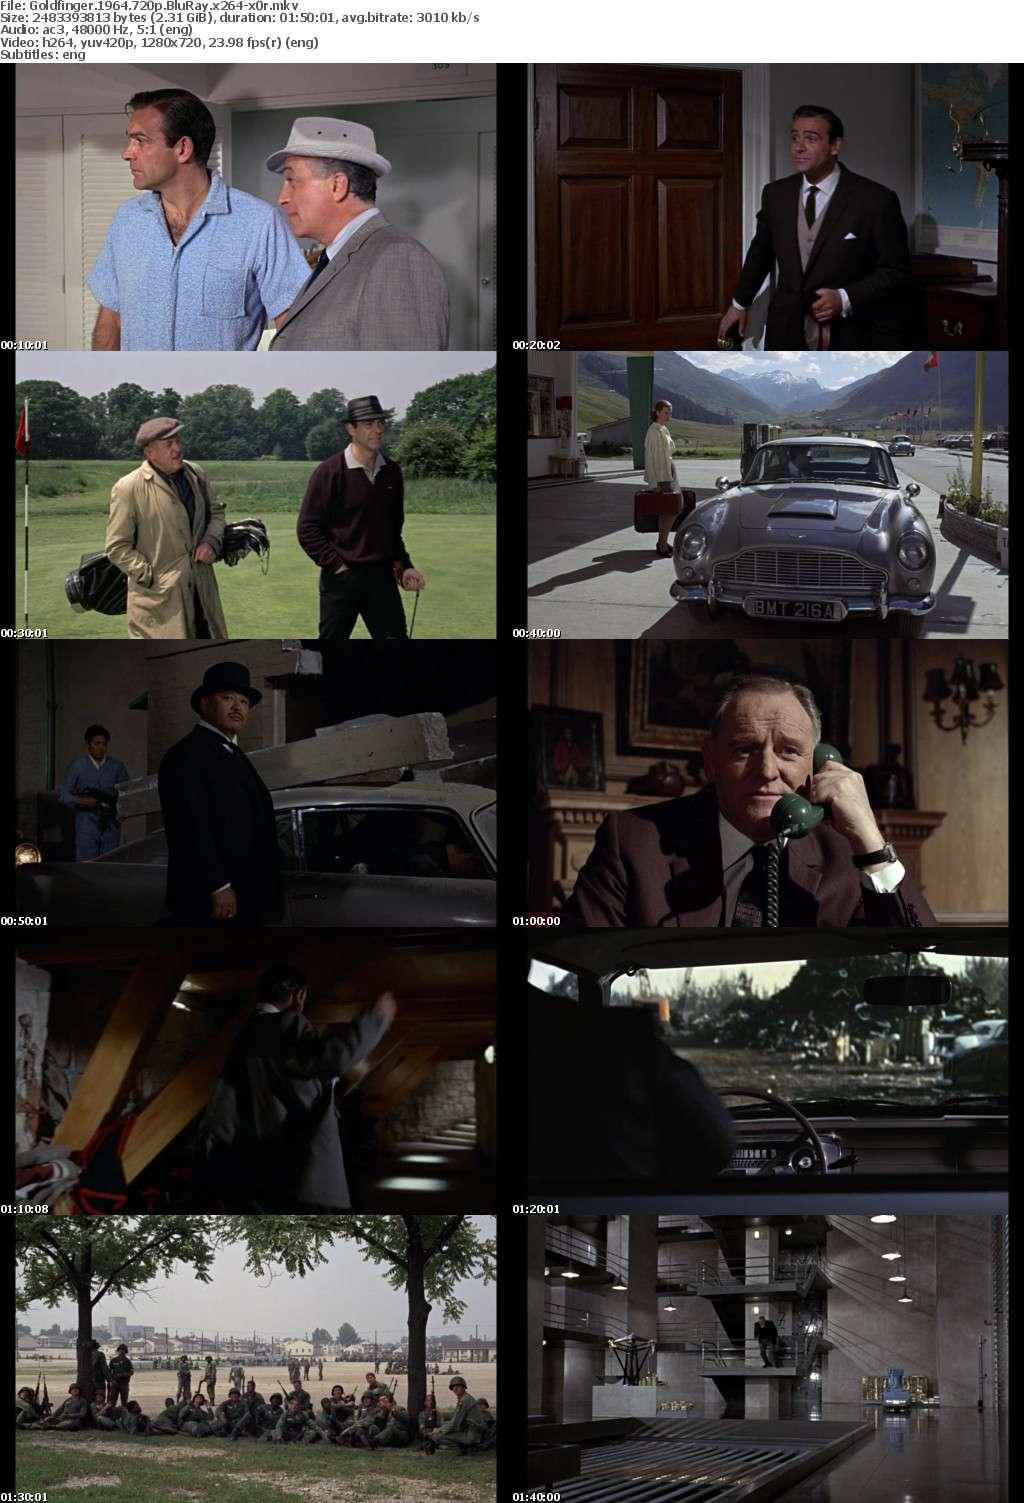 Goldfinger 1964 720p BluRay x264-x0r